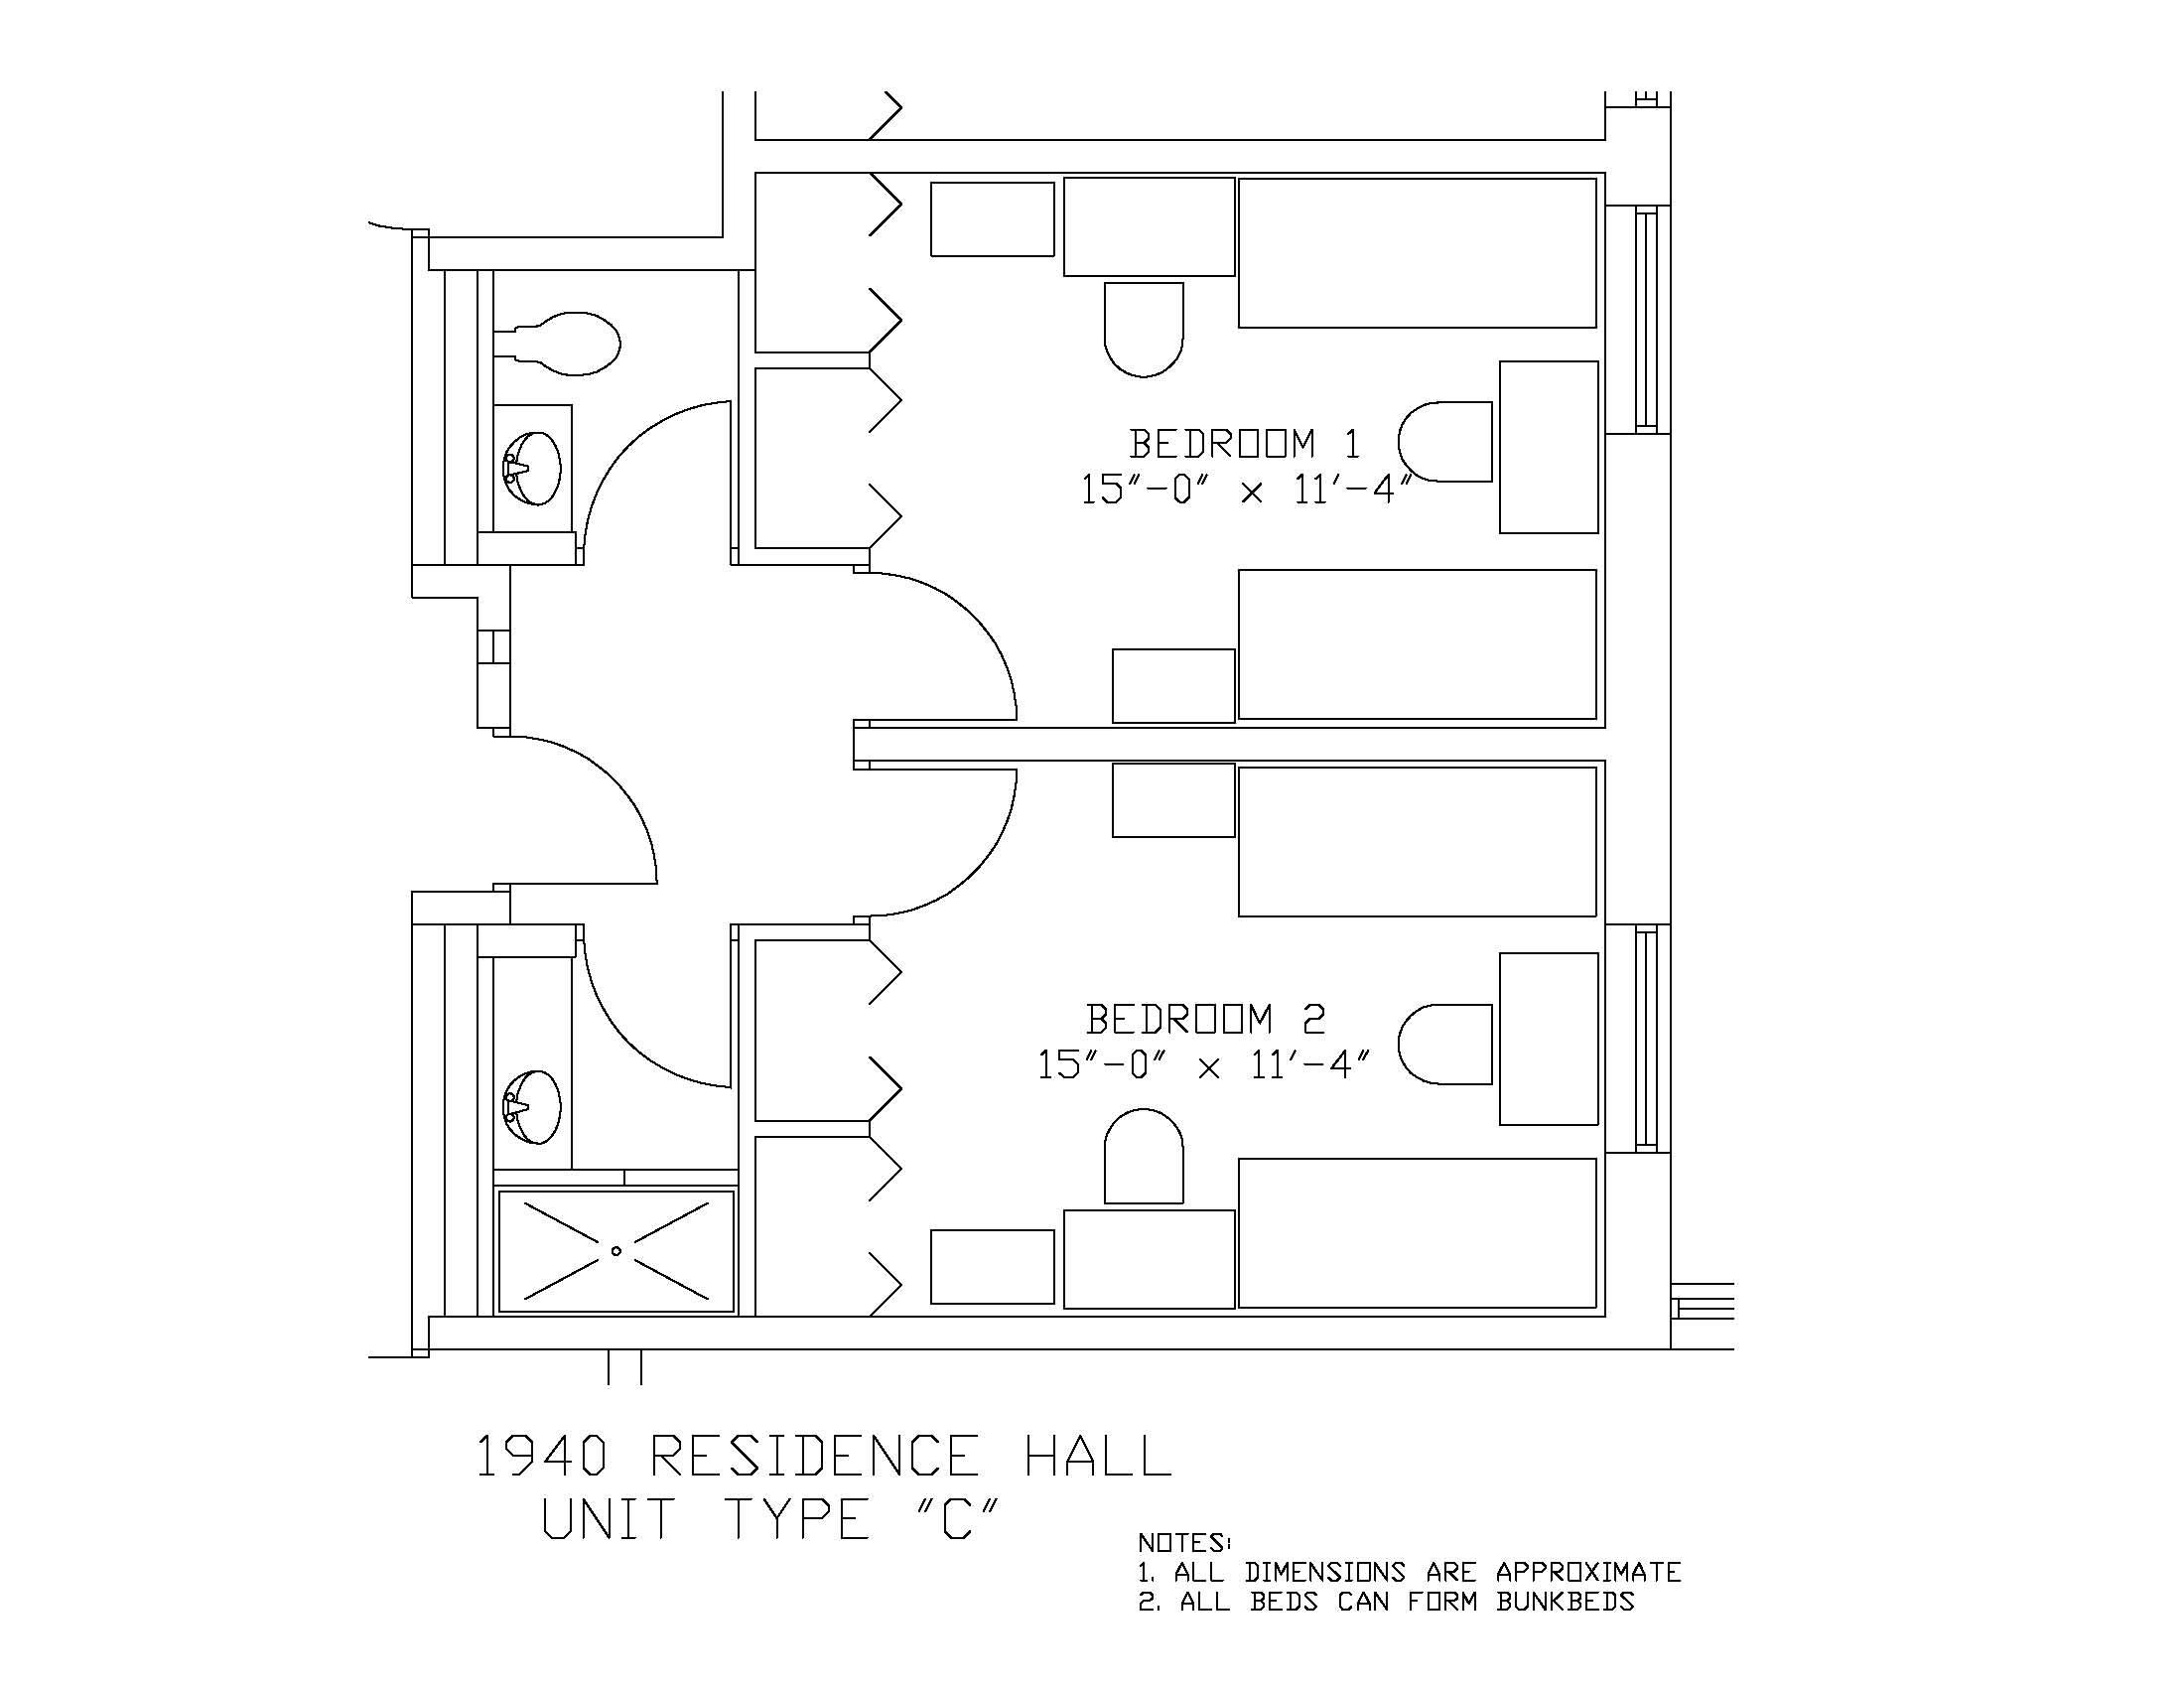 1940 Residence Hall: Type C